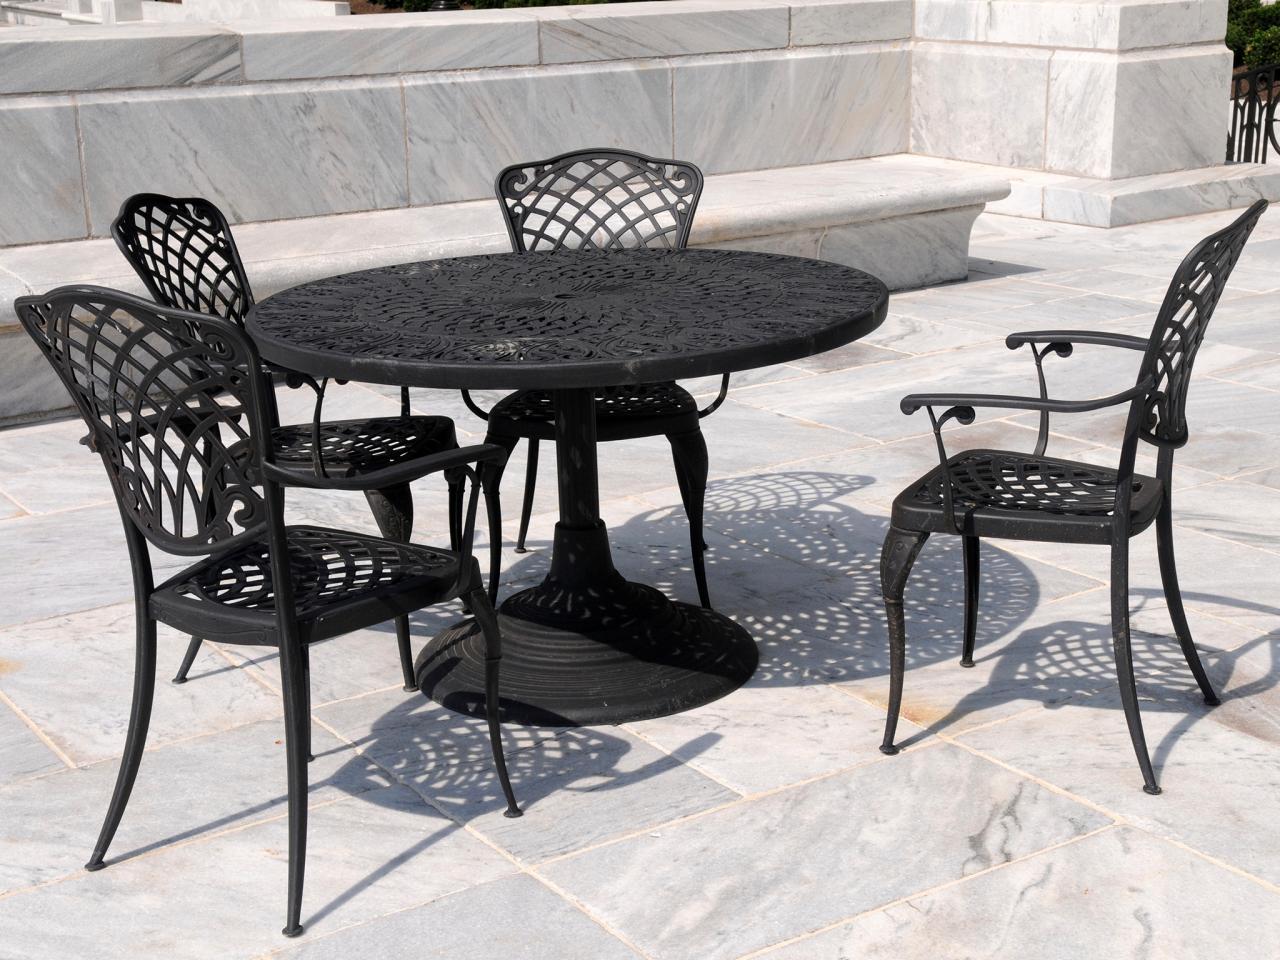 metal outdoor furniture wrought iron patio furniture XRSLYFM